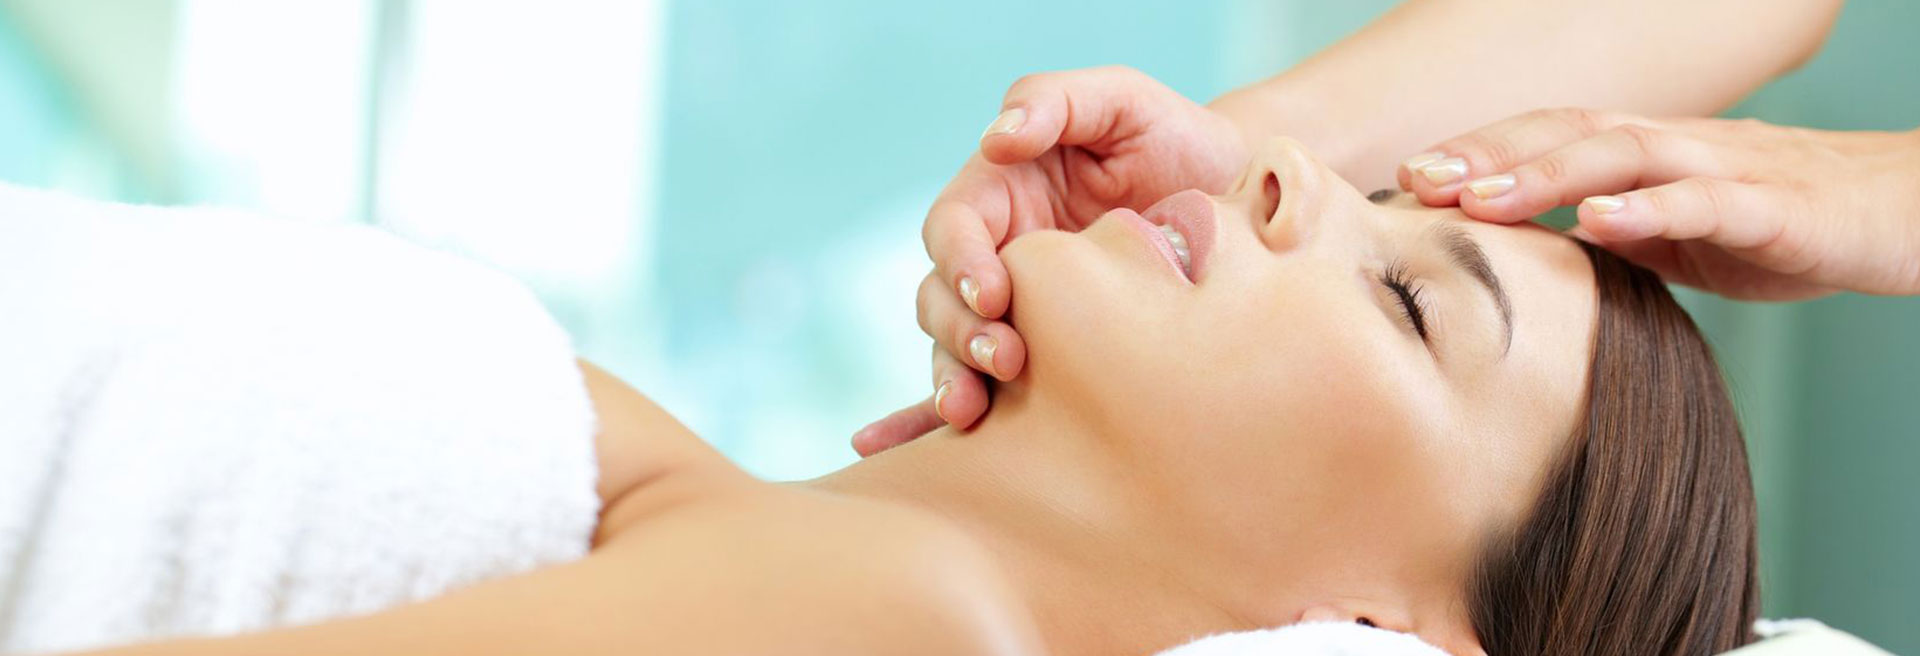 Revitalizing facial Massage